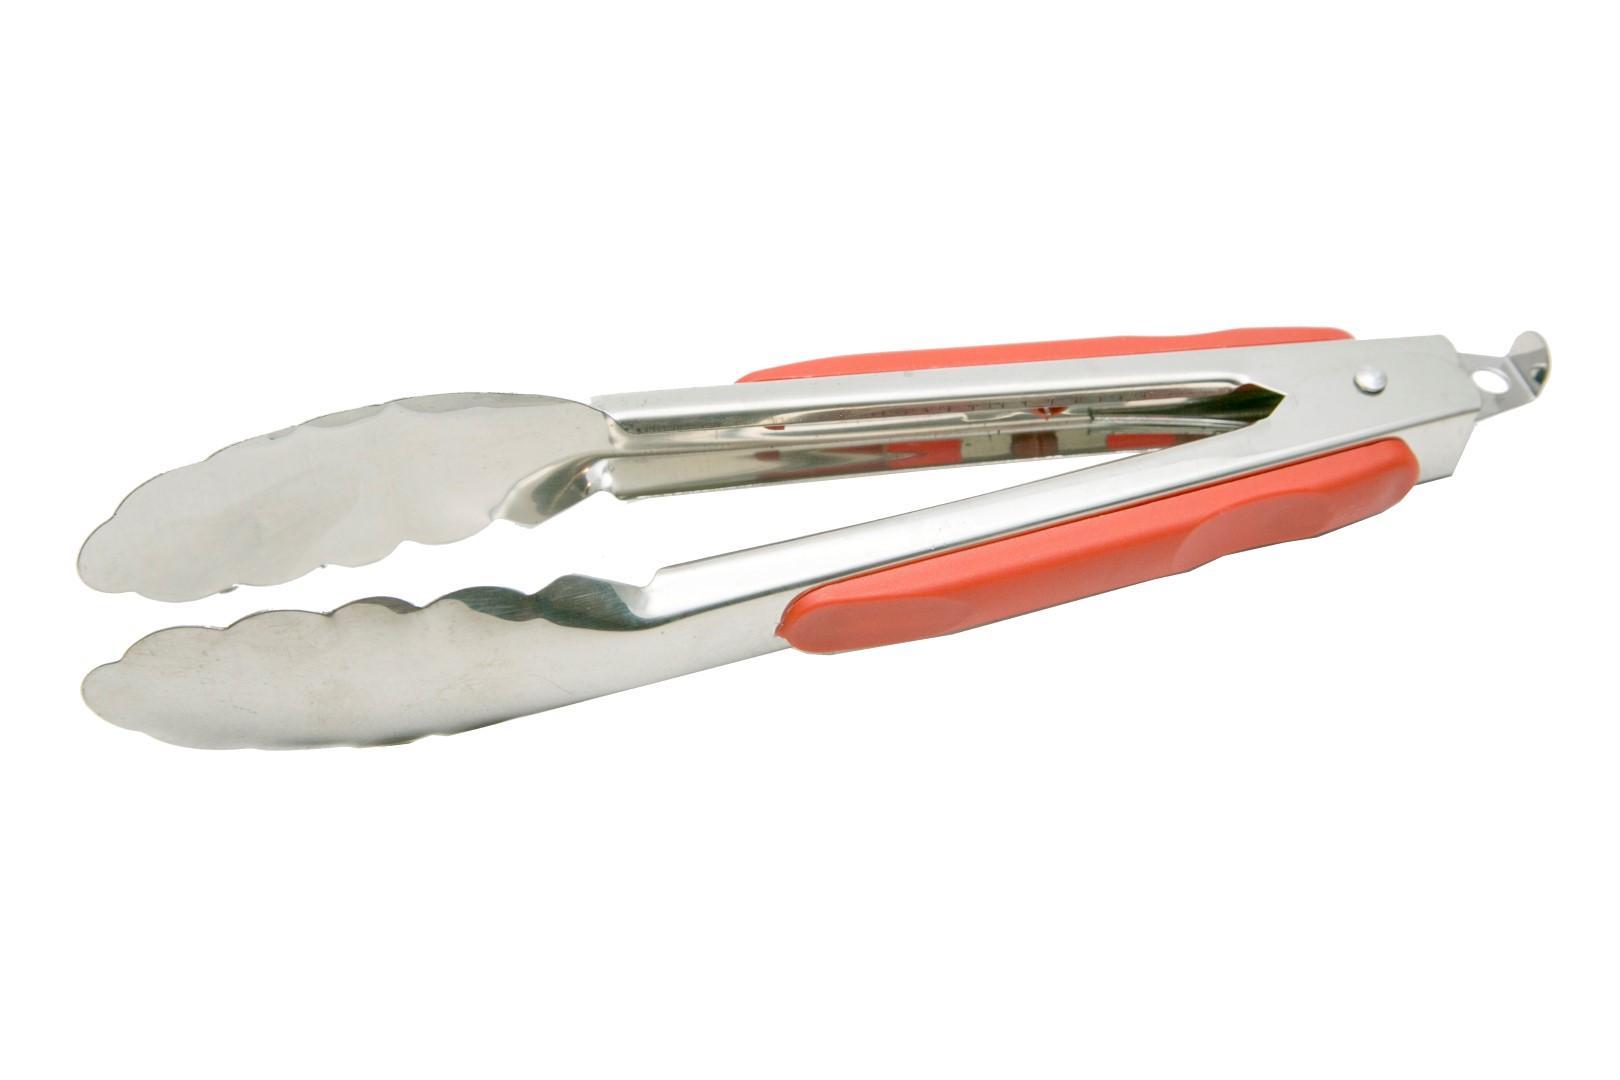 Alat Peralatan Masak Terlengkap Oxone Kitchen Tools Nylon Ox 953 Penjepit Capitan Makanan Gorengan Stainless Merah Tebal 225 Cm 9 Phm9